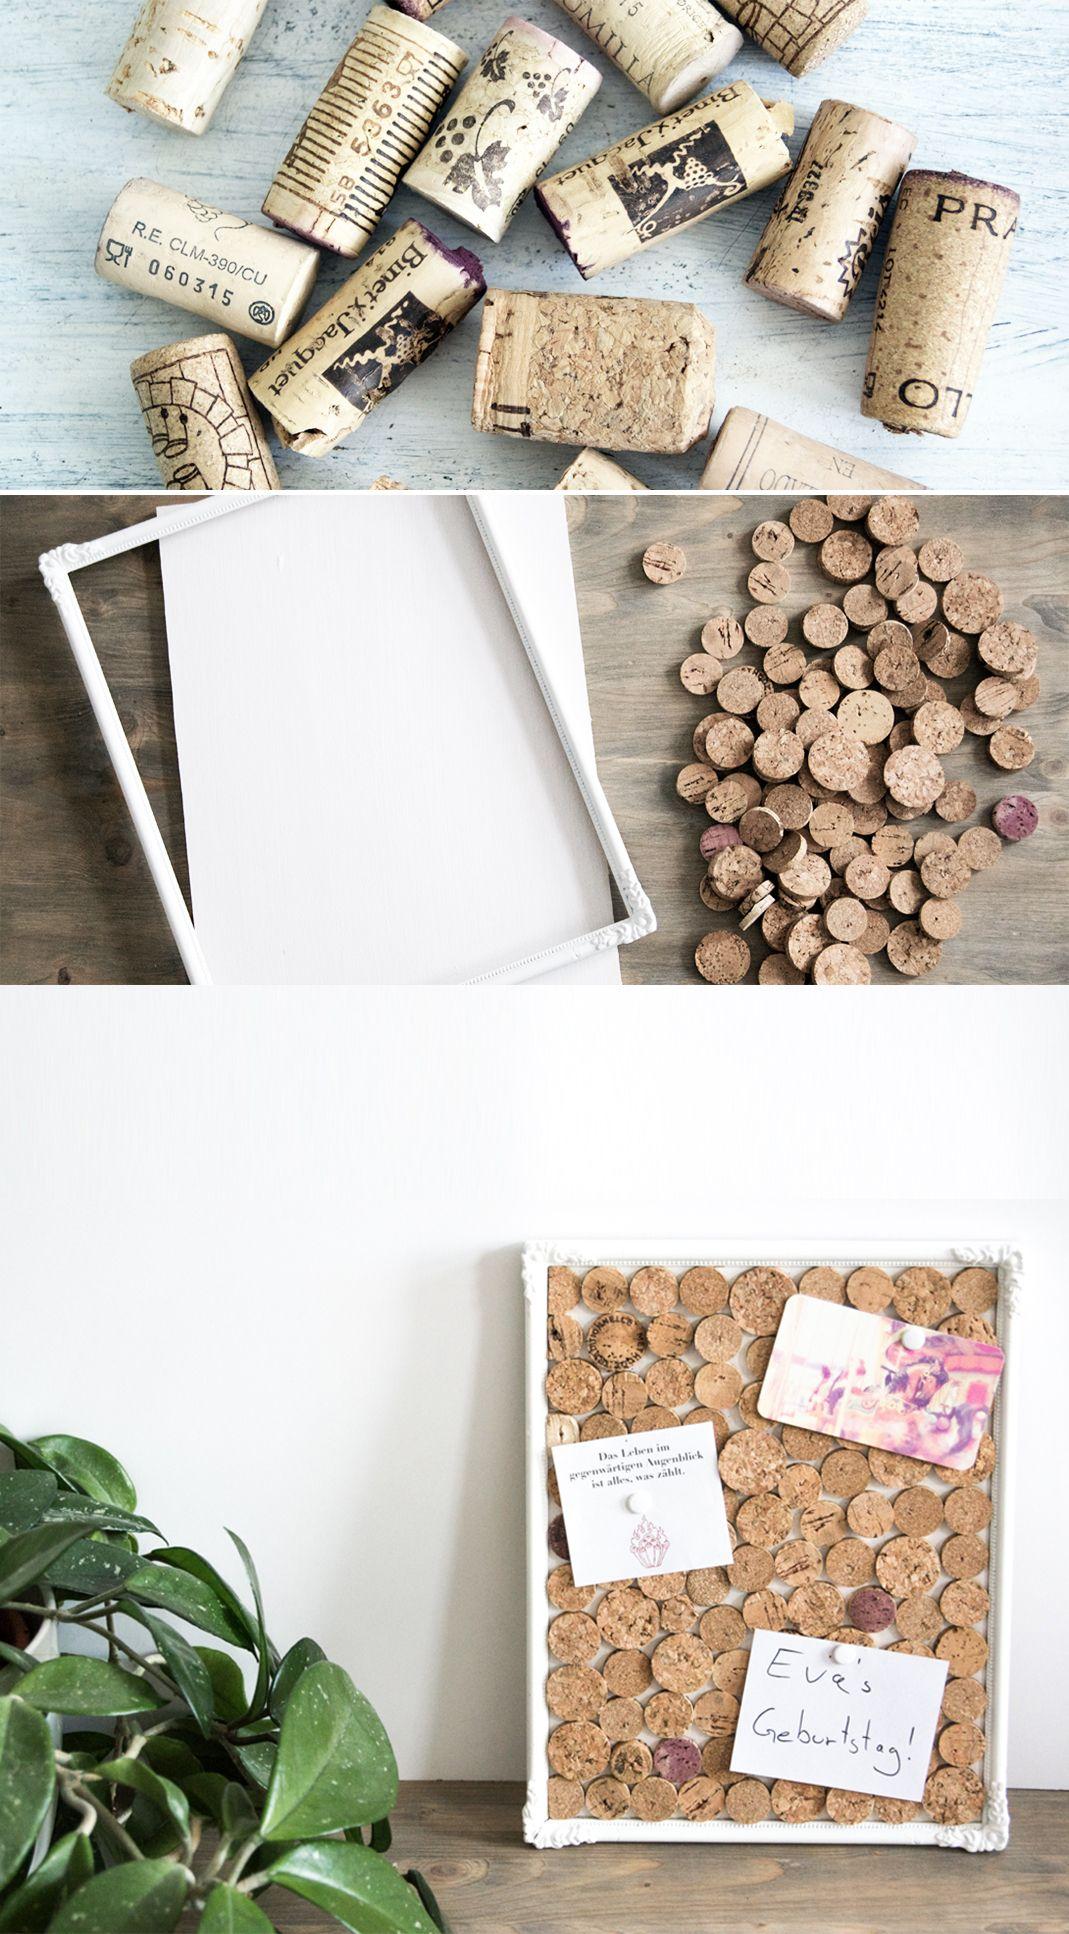 schereleimpapier f r froschblog kork upcycling. Black Bedroom Furniture Sets. Home Design Ideas